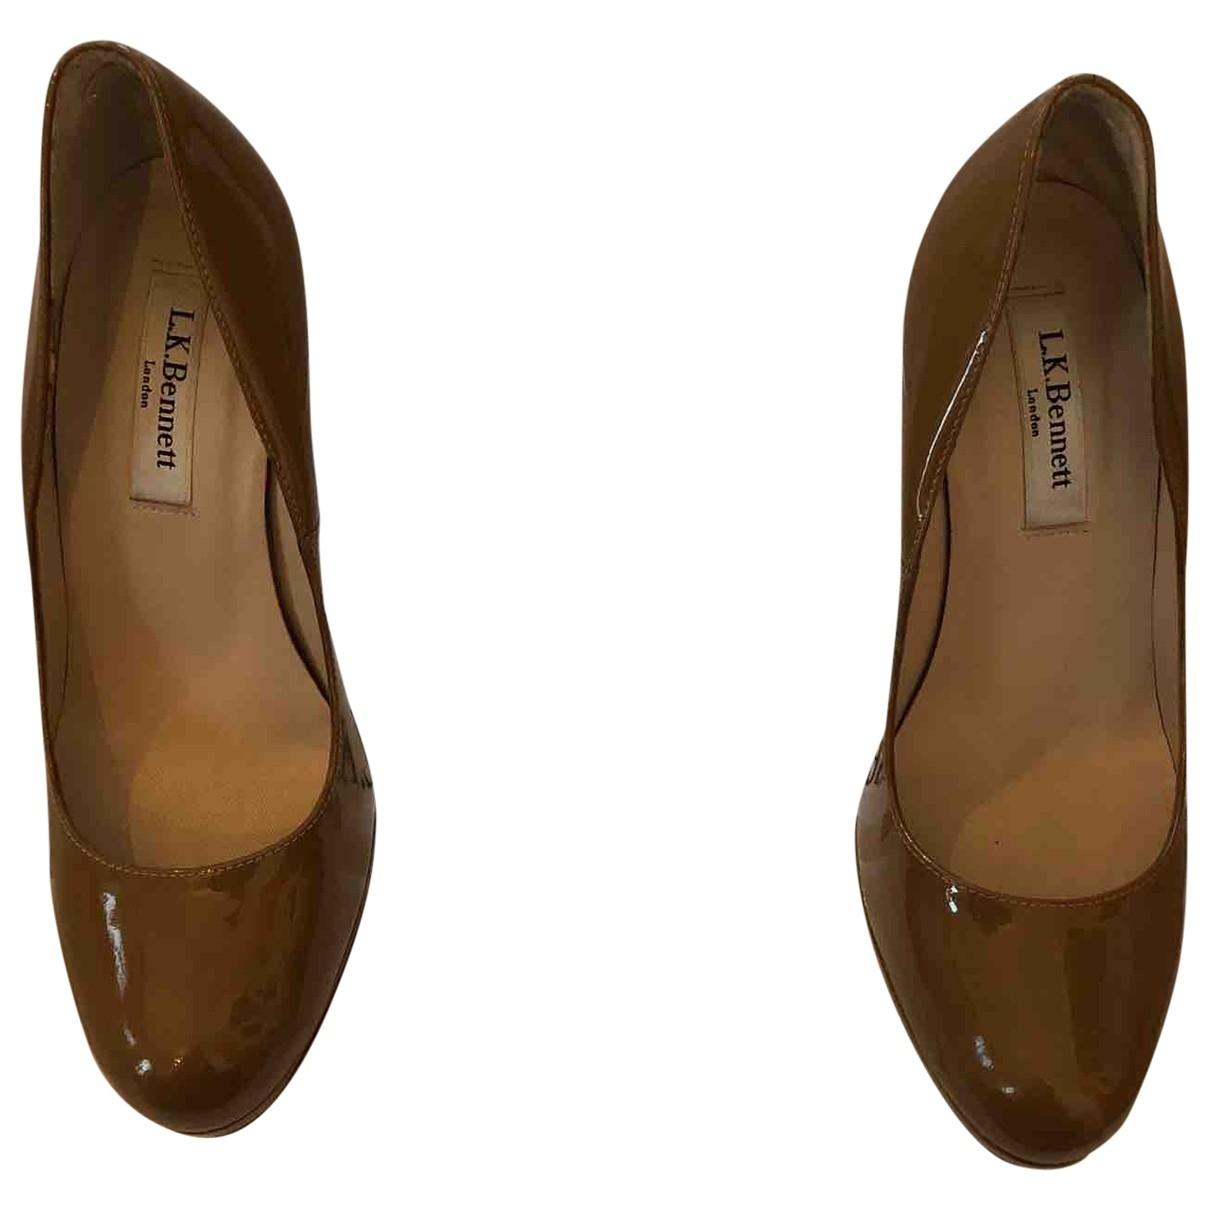 Lk Bennett \N Camel Patent leather Heels for Women 36 EU